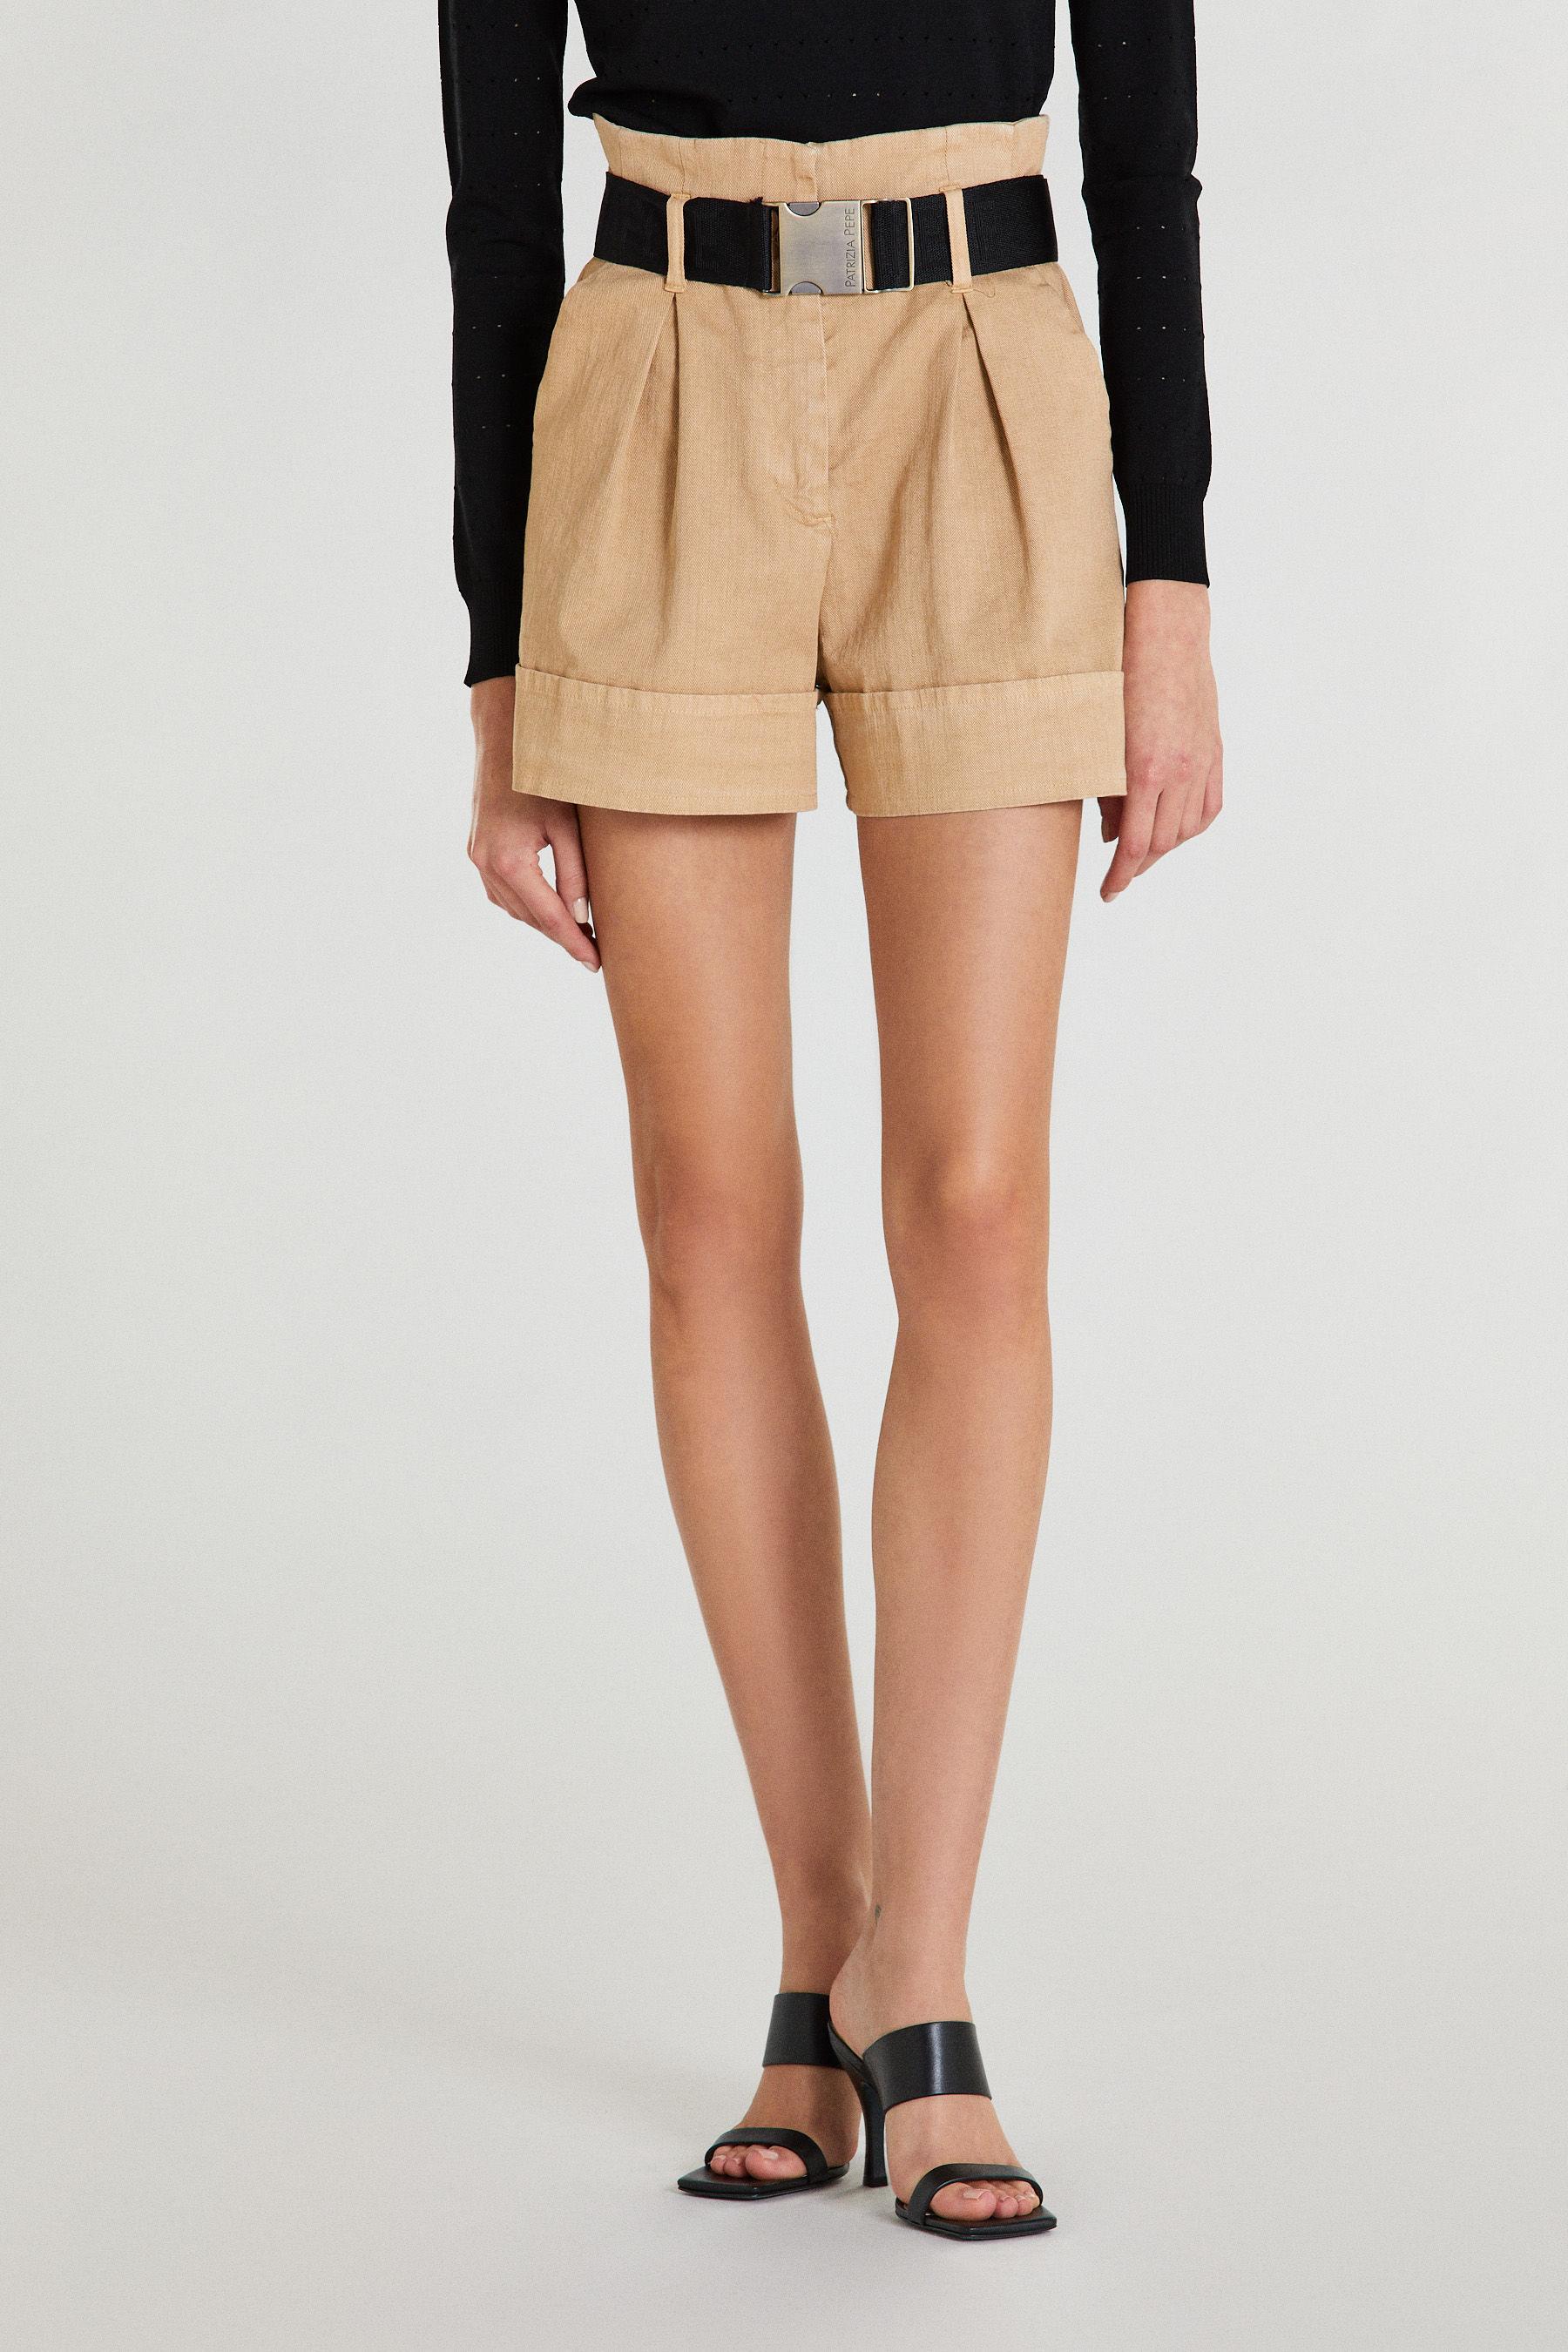 Shorts con cintura Patrizia Pepe PATRIZIA PEPE | Shorts | 8P0322-A8S1B699